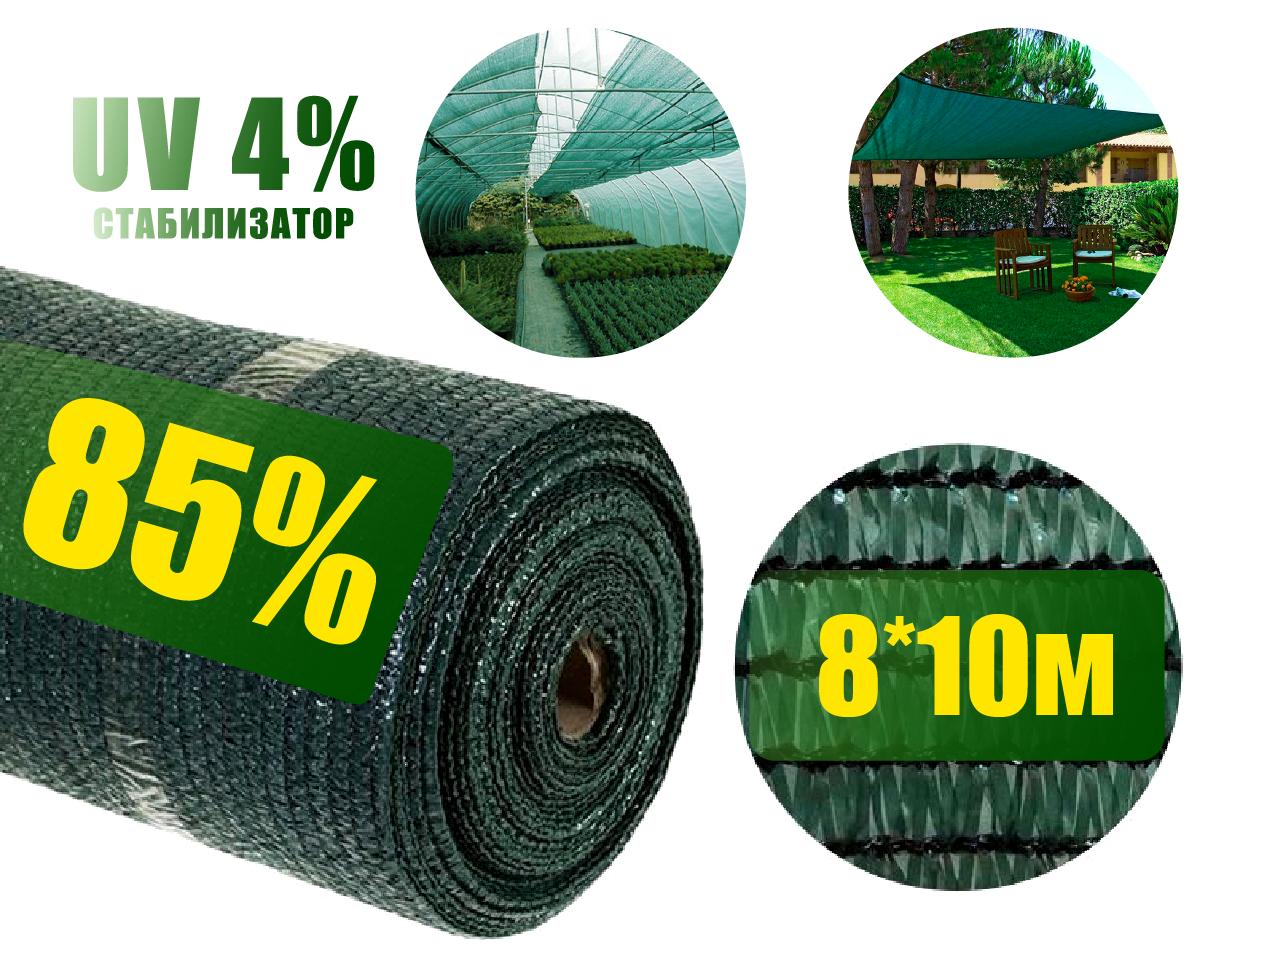 Затеняющая сетка  85%  8м*10м зеленая